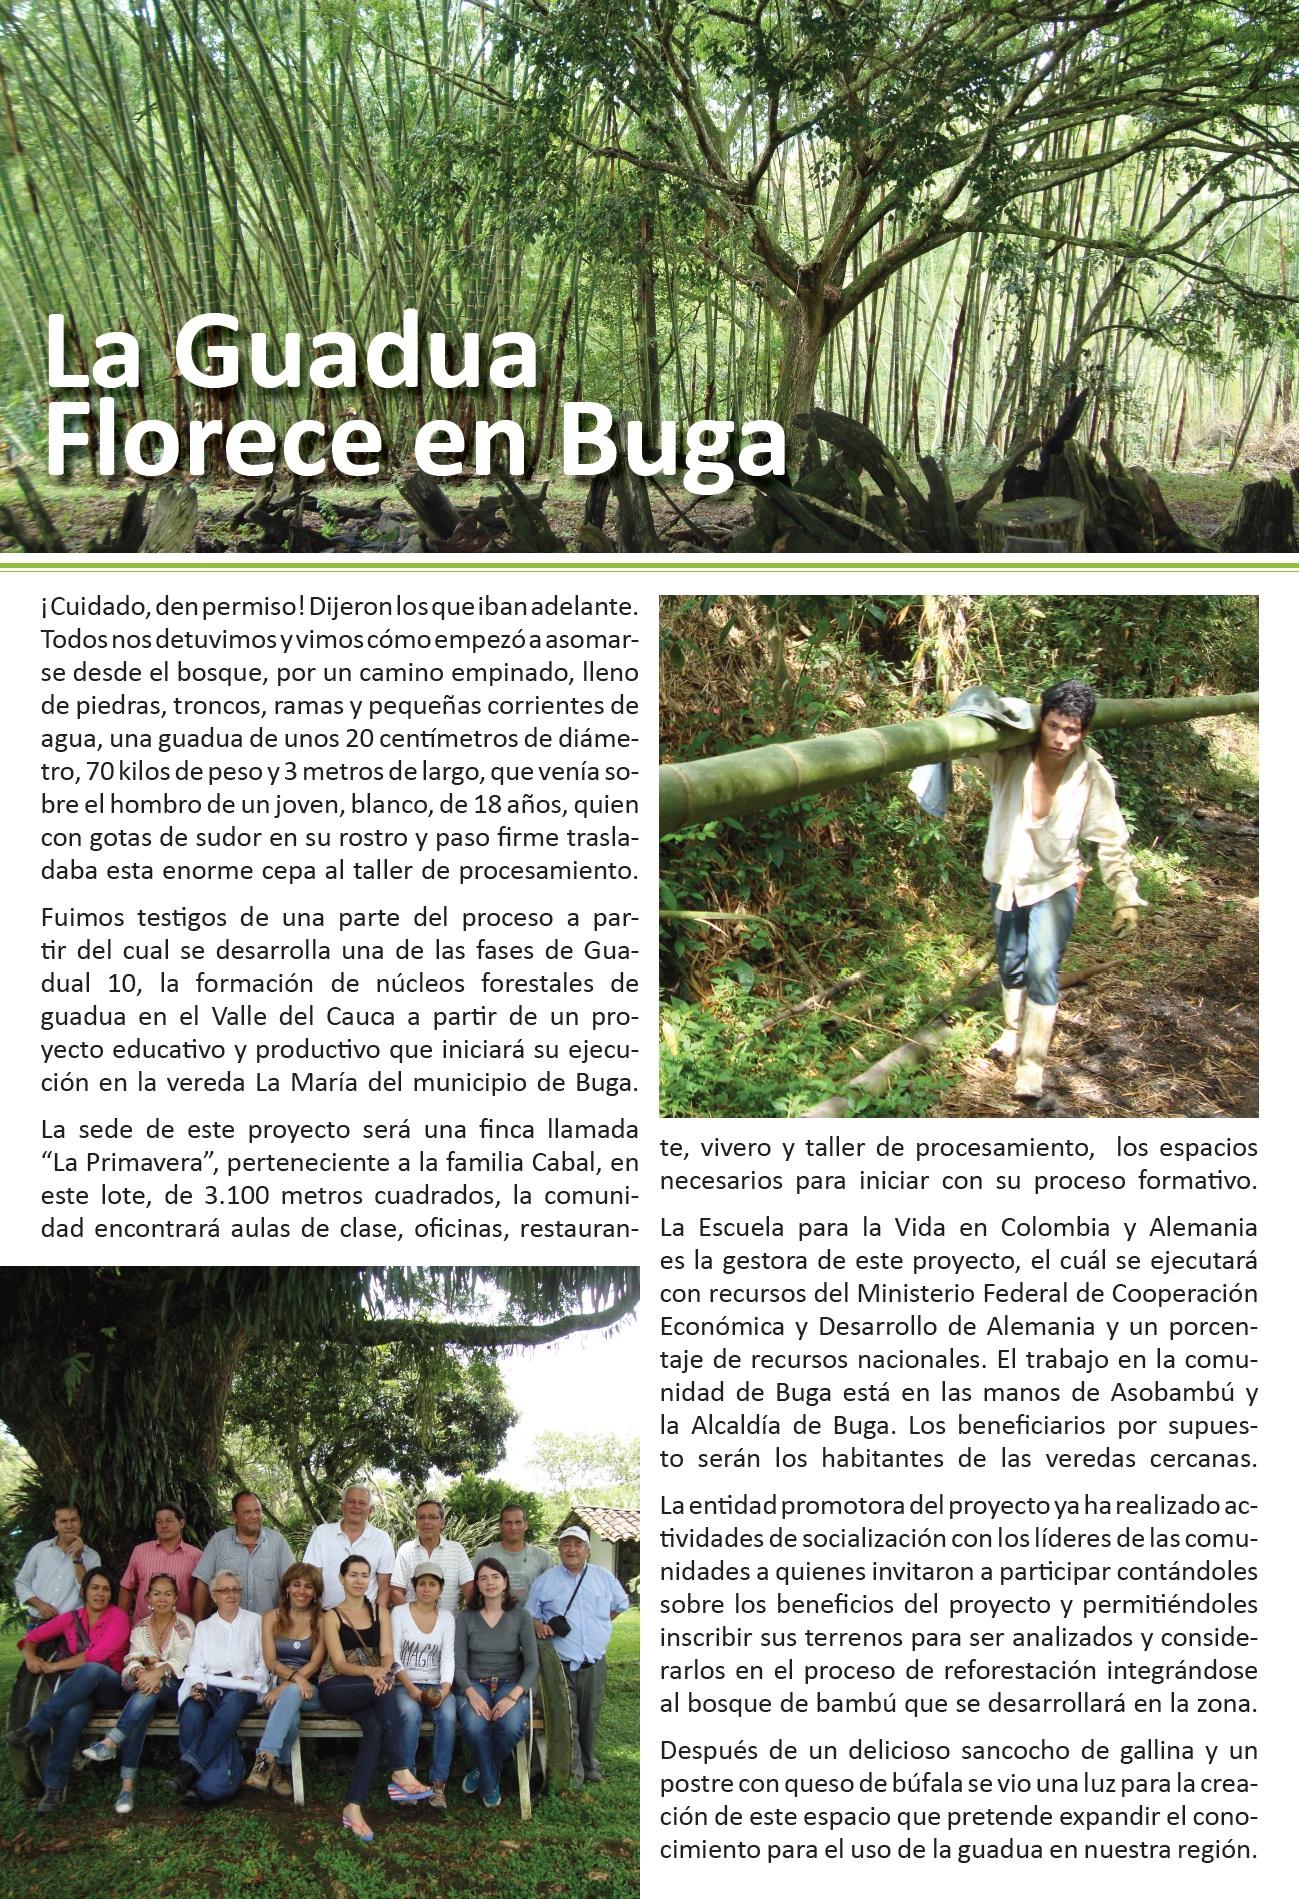 La Guadua Florece en Buga